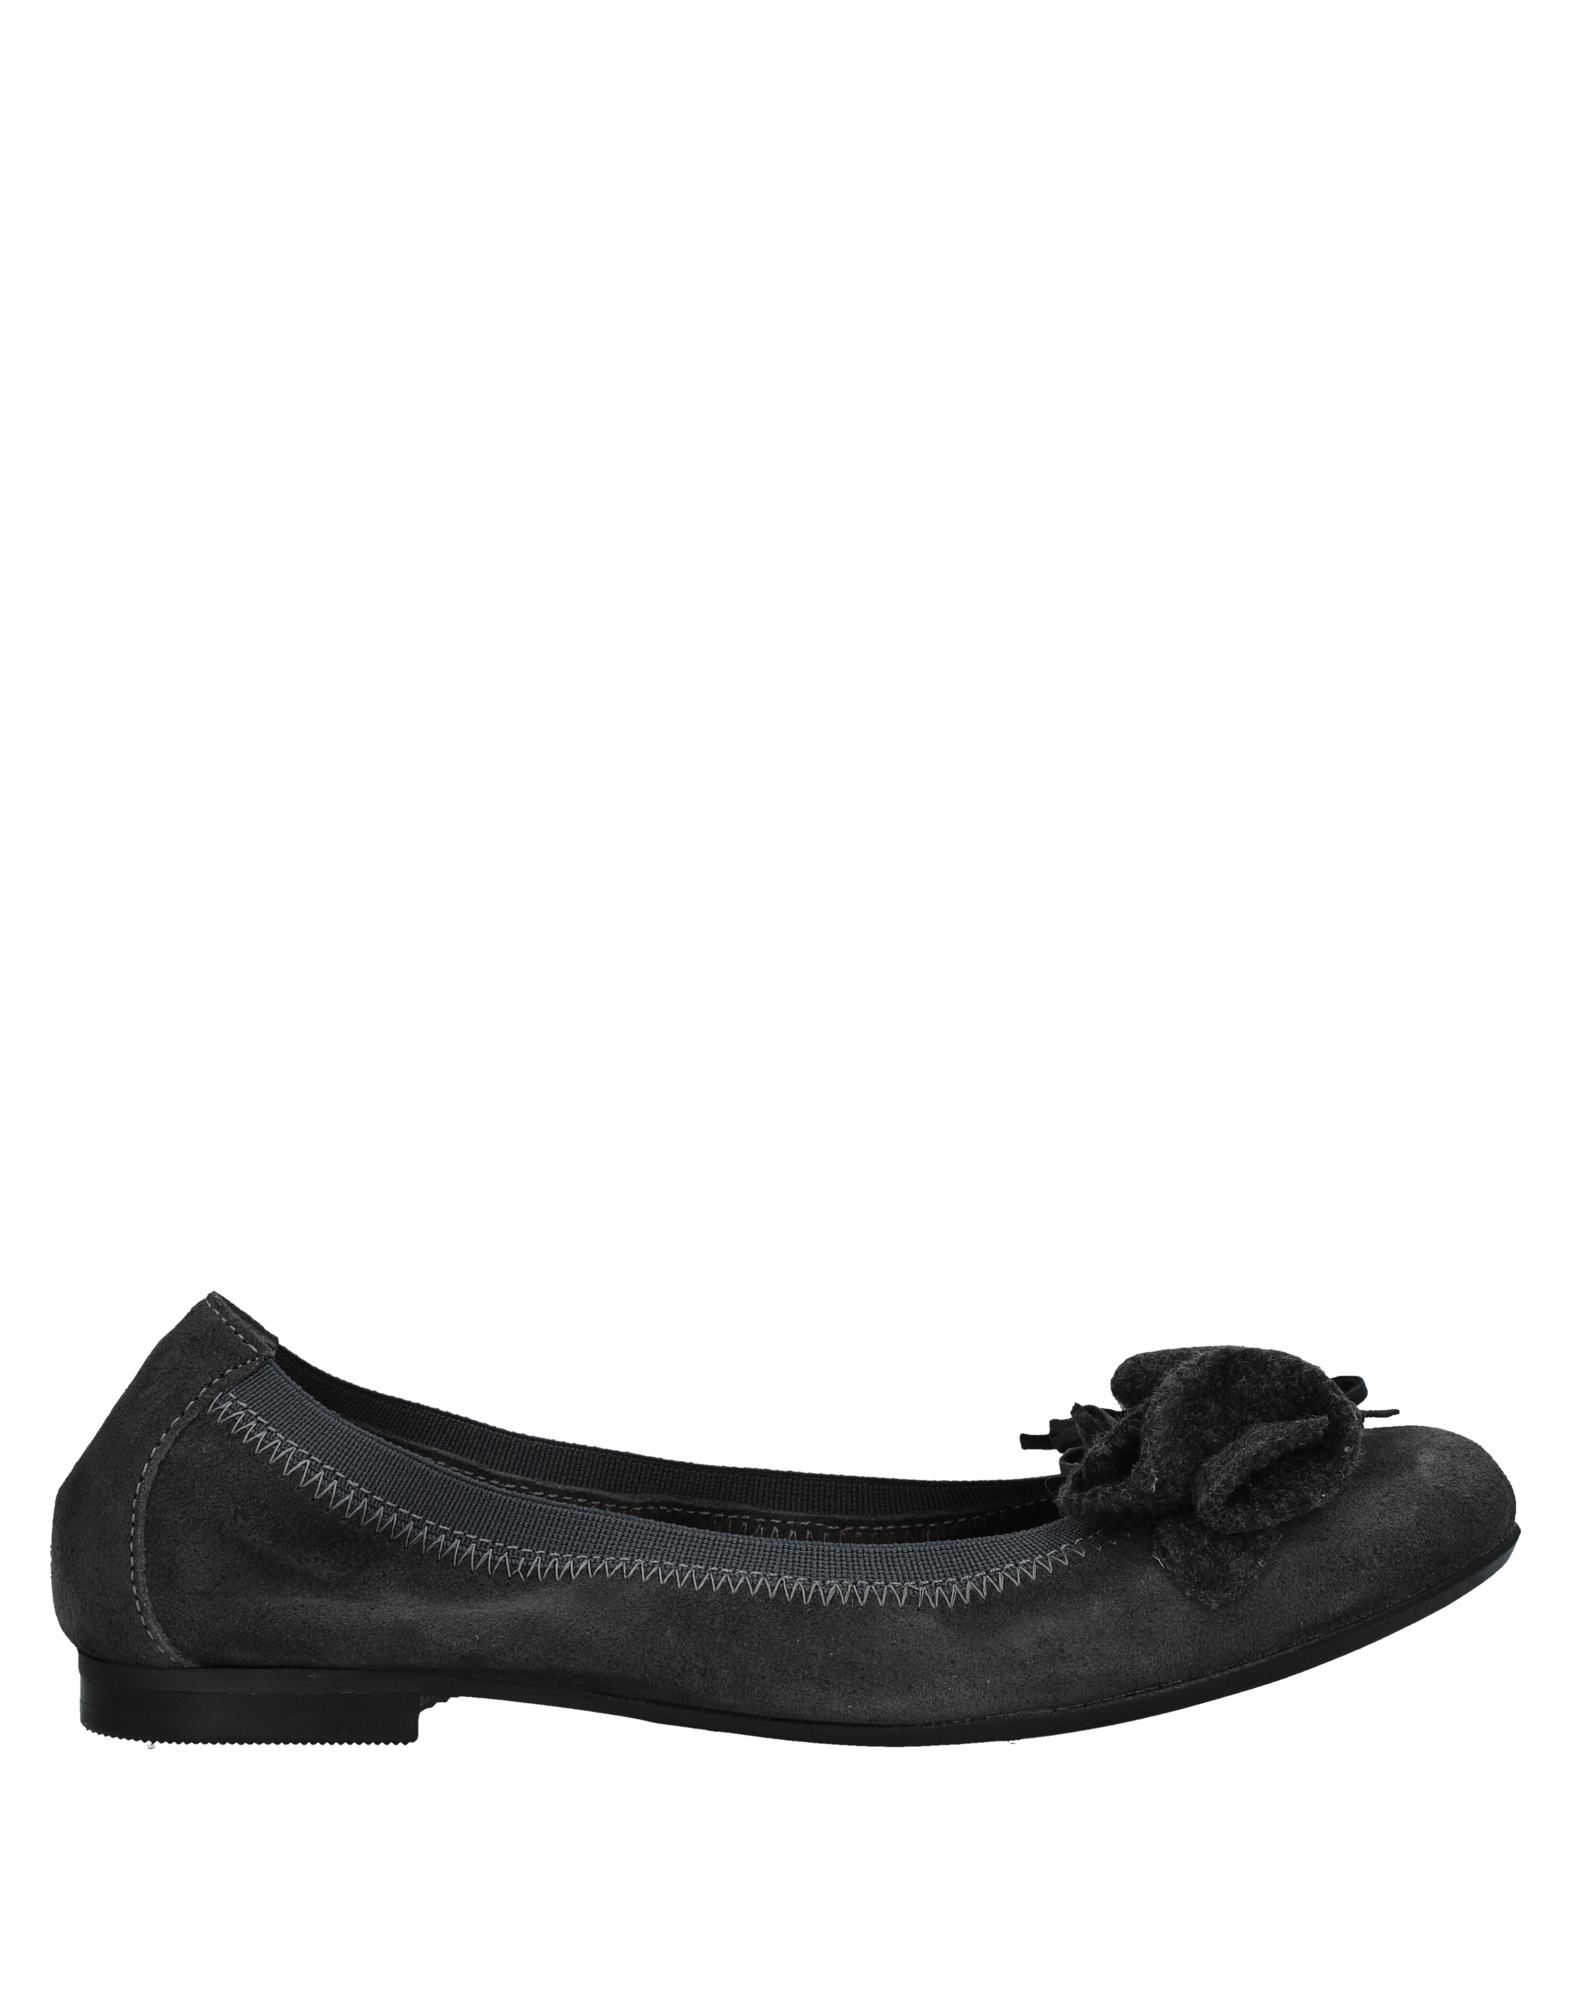 Clocharme Ballerinas Damen  11535889RT Gute Qualität beliebte Schuhe